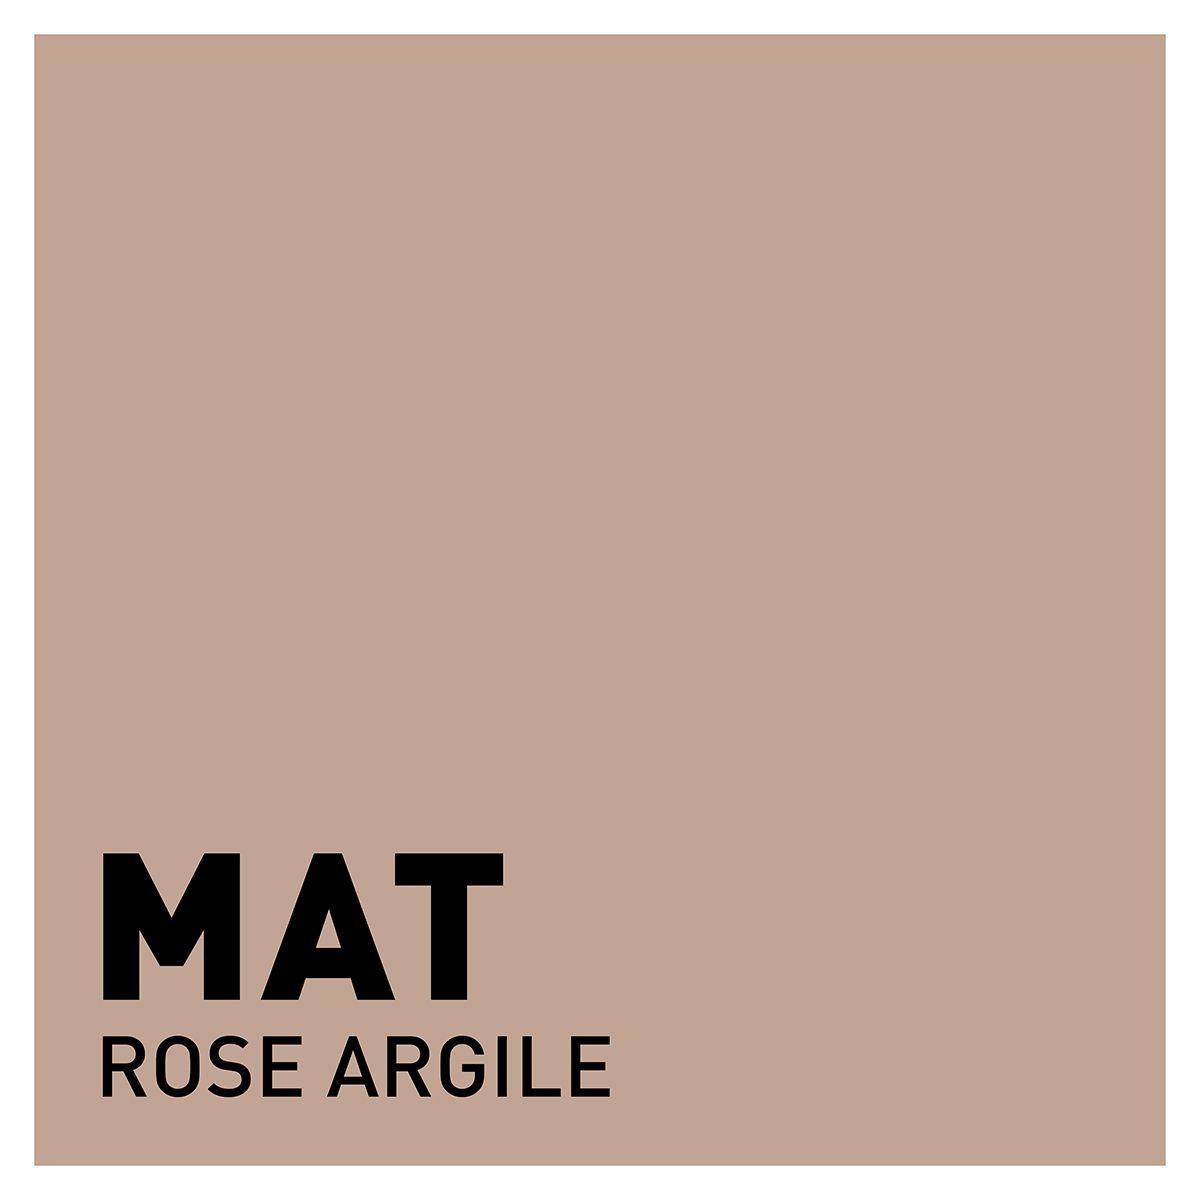 Peinture rose argile mat 20 minutes chrono Renaulac